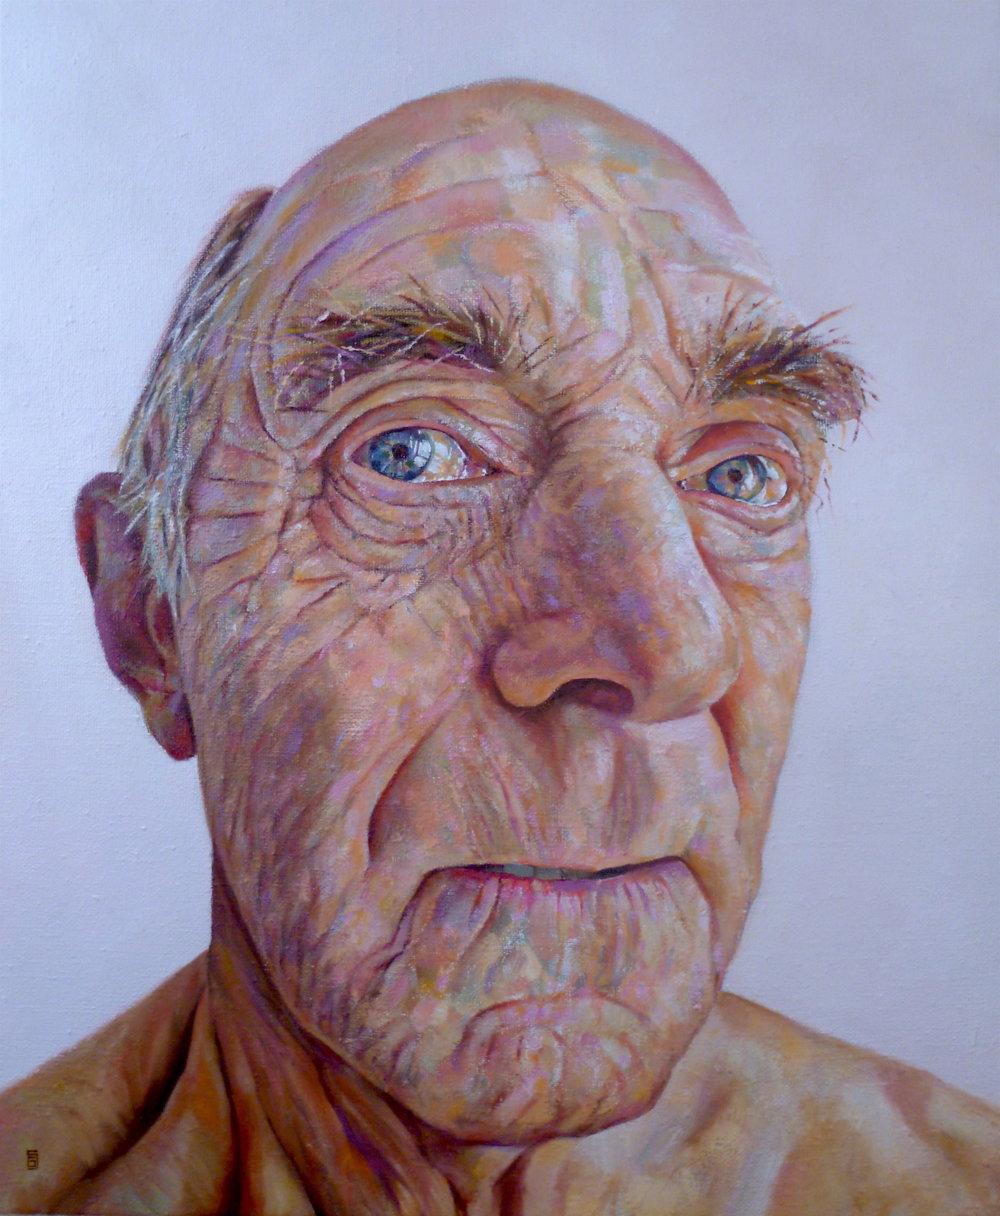 Geoff Shillito, Jeff, Oil on Linen, 63cm x 53cm,  http://www.geoffshillito.com